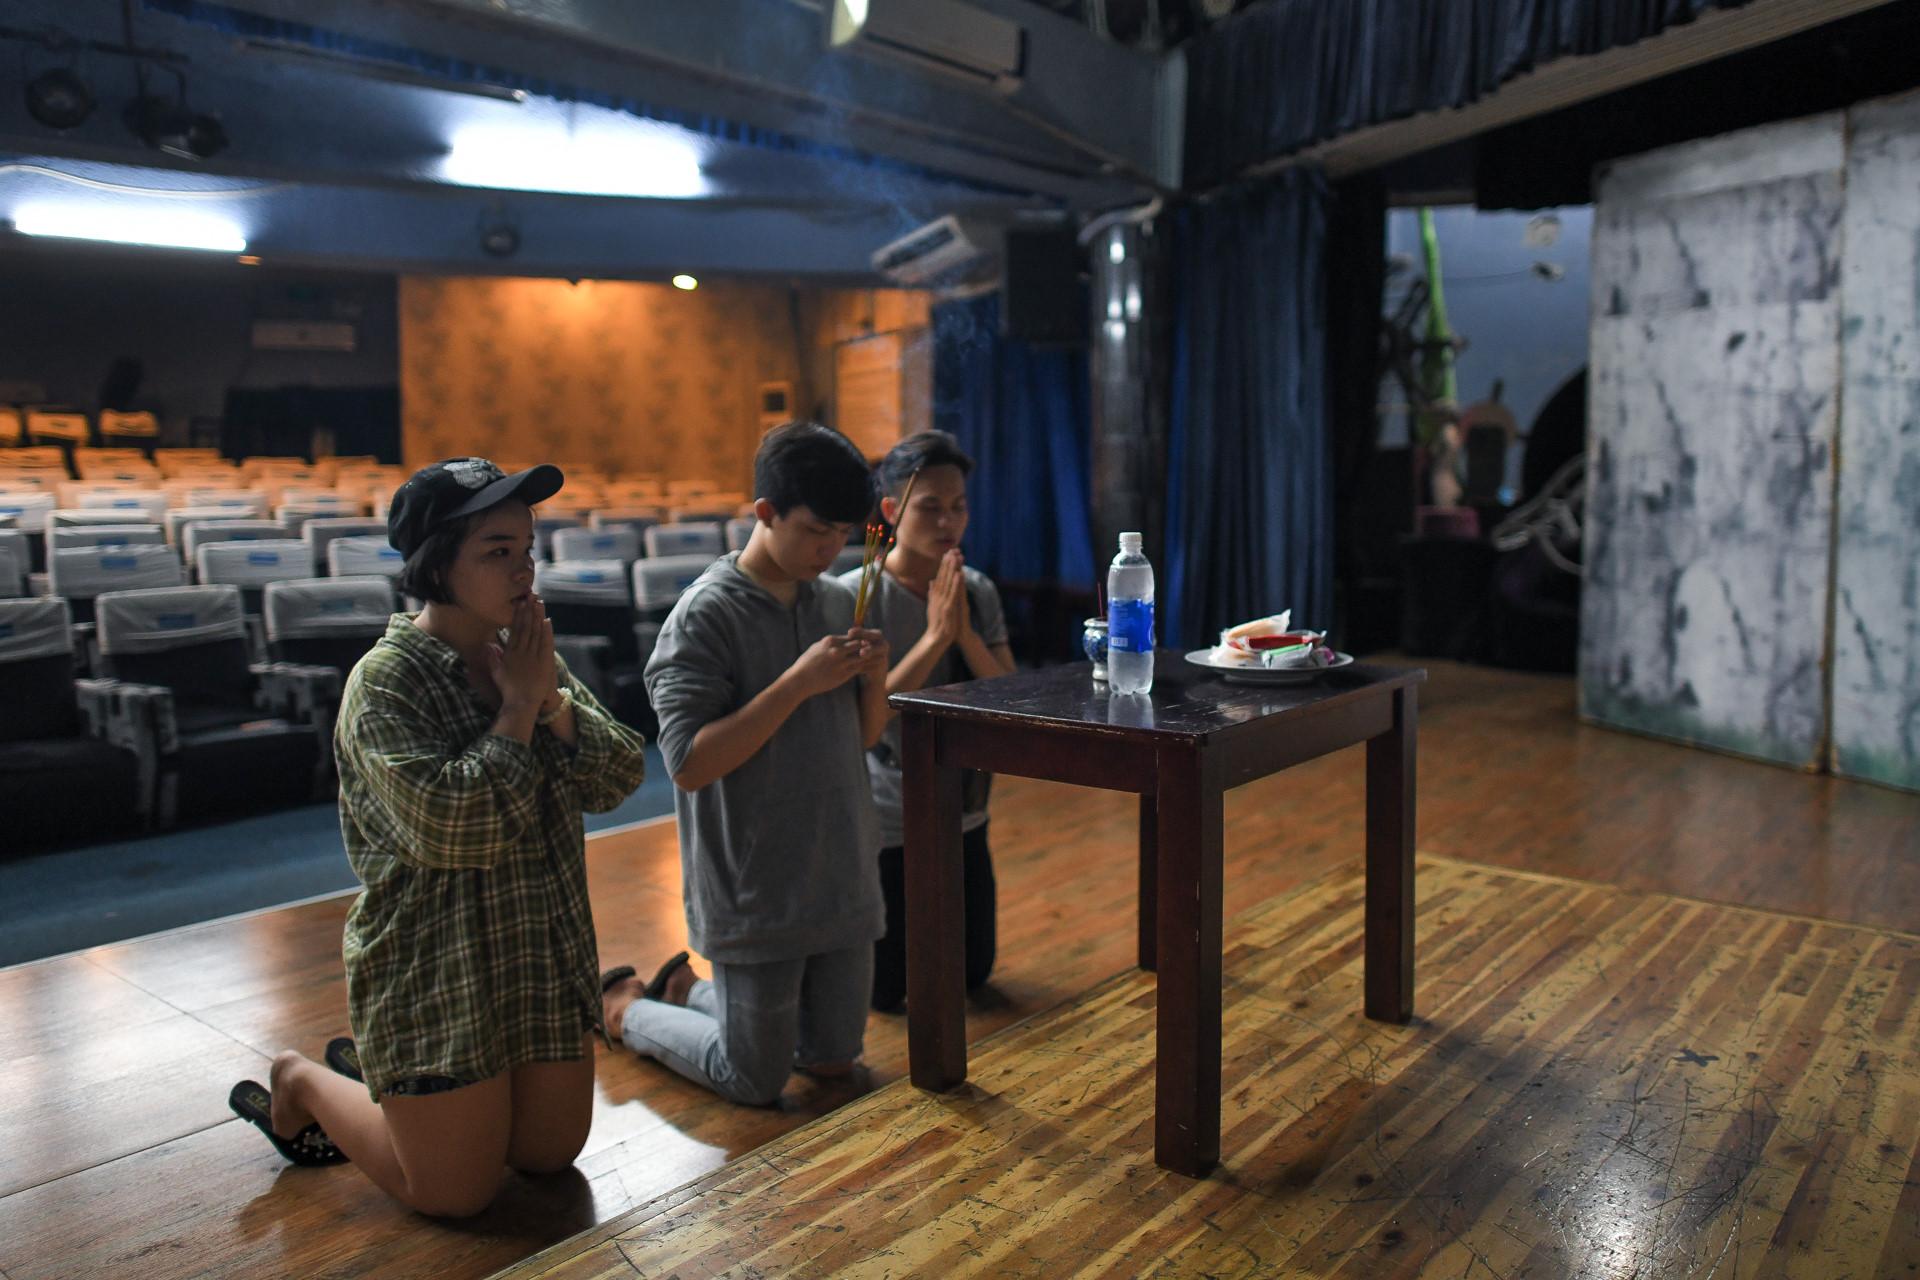 Dem dien cuoi o san khau Hong Van: Chuyen sau tam man nhung hinh anh 12